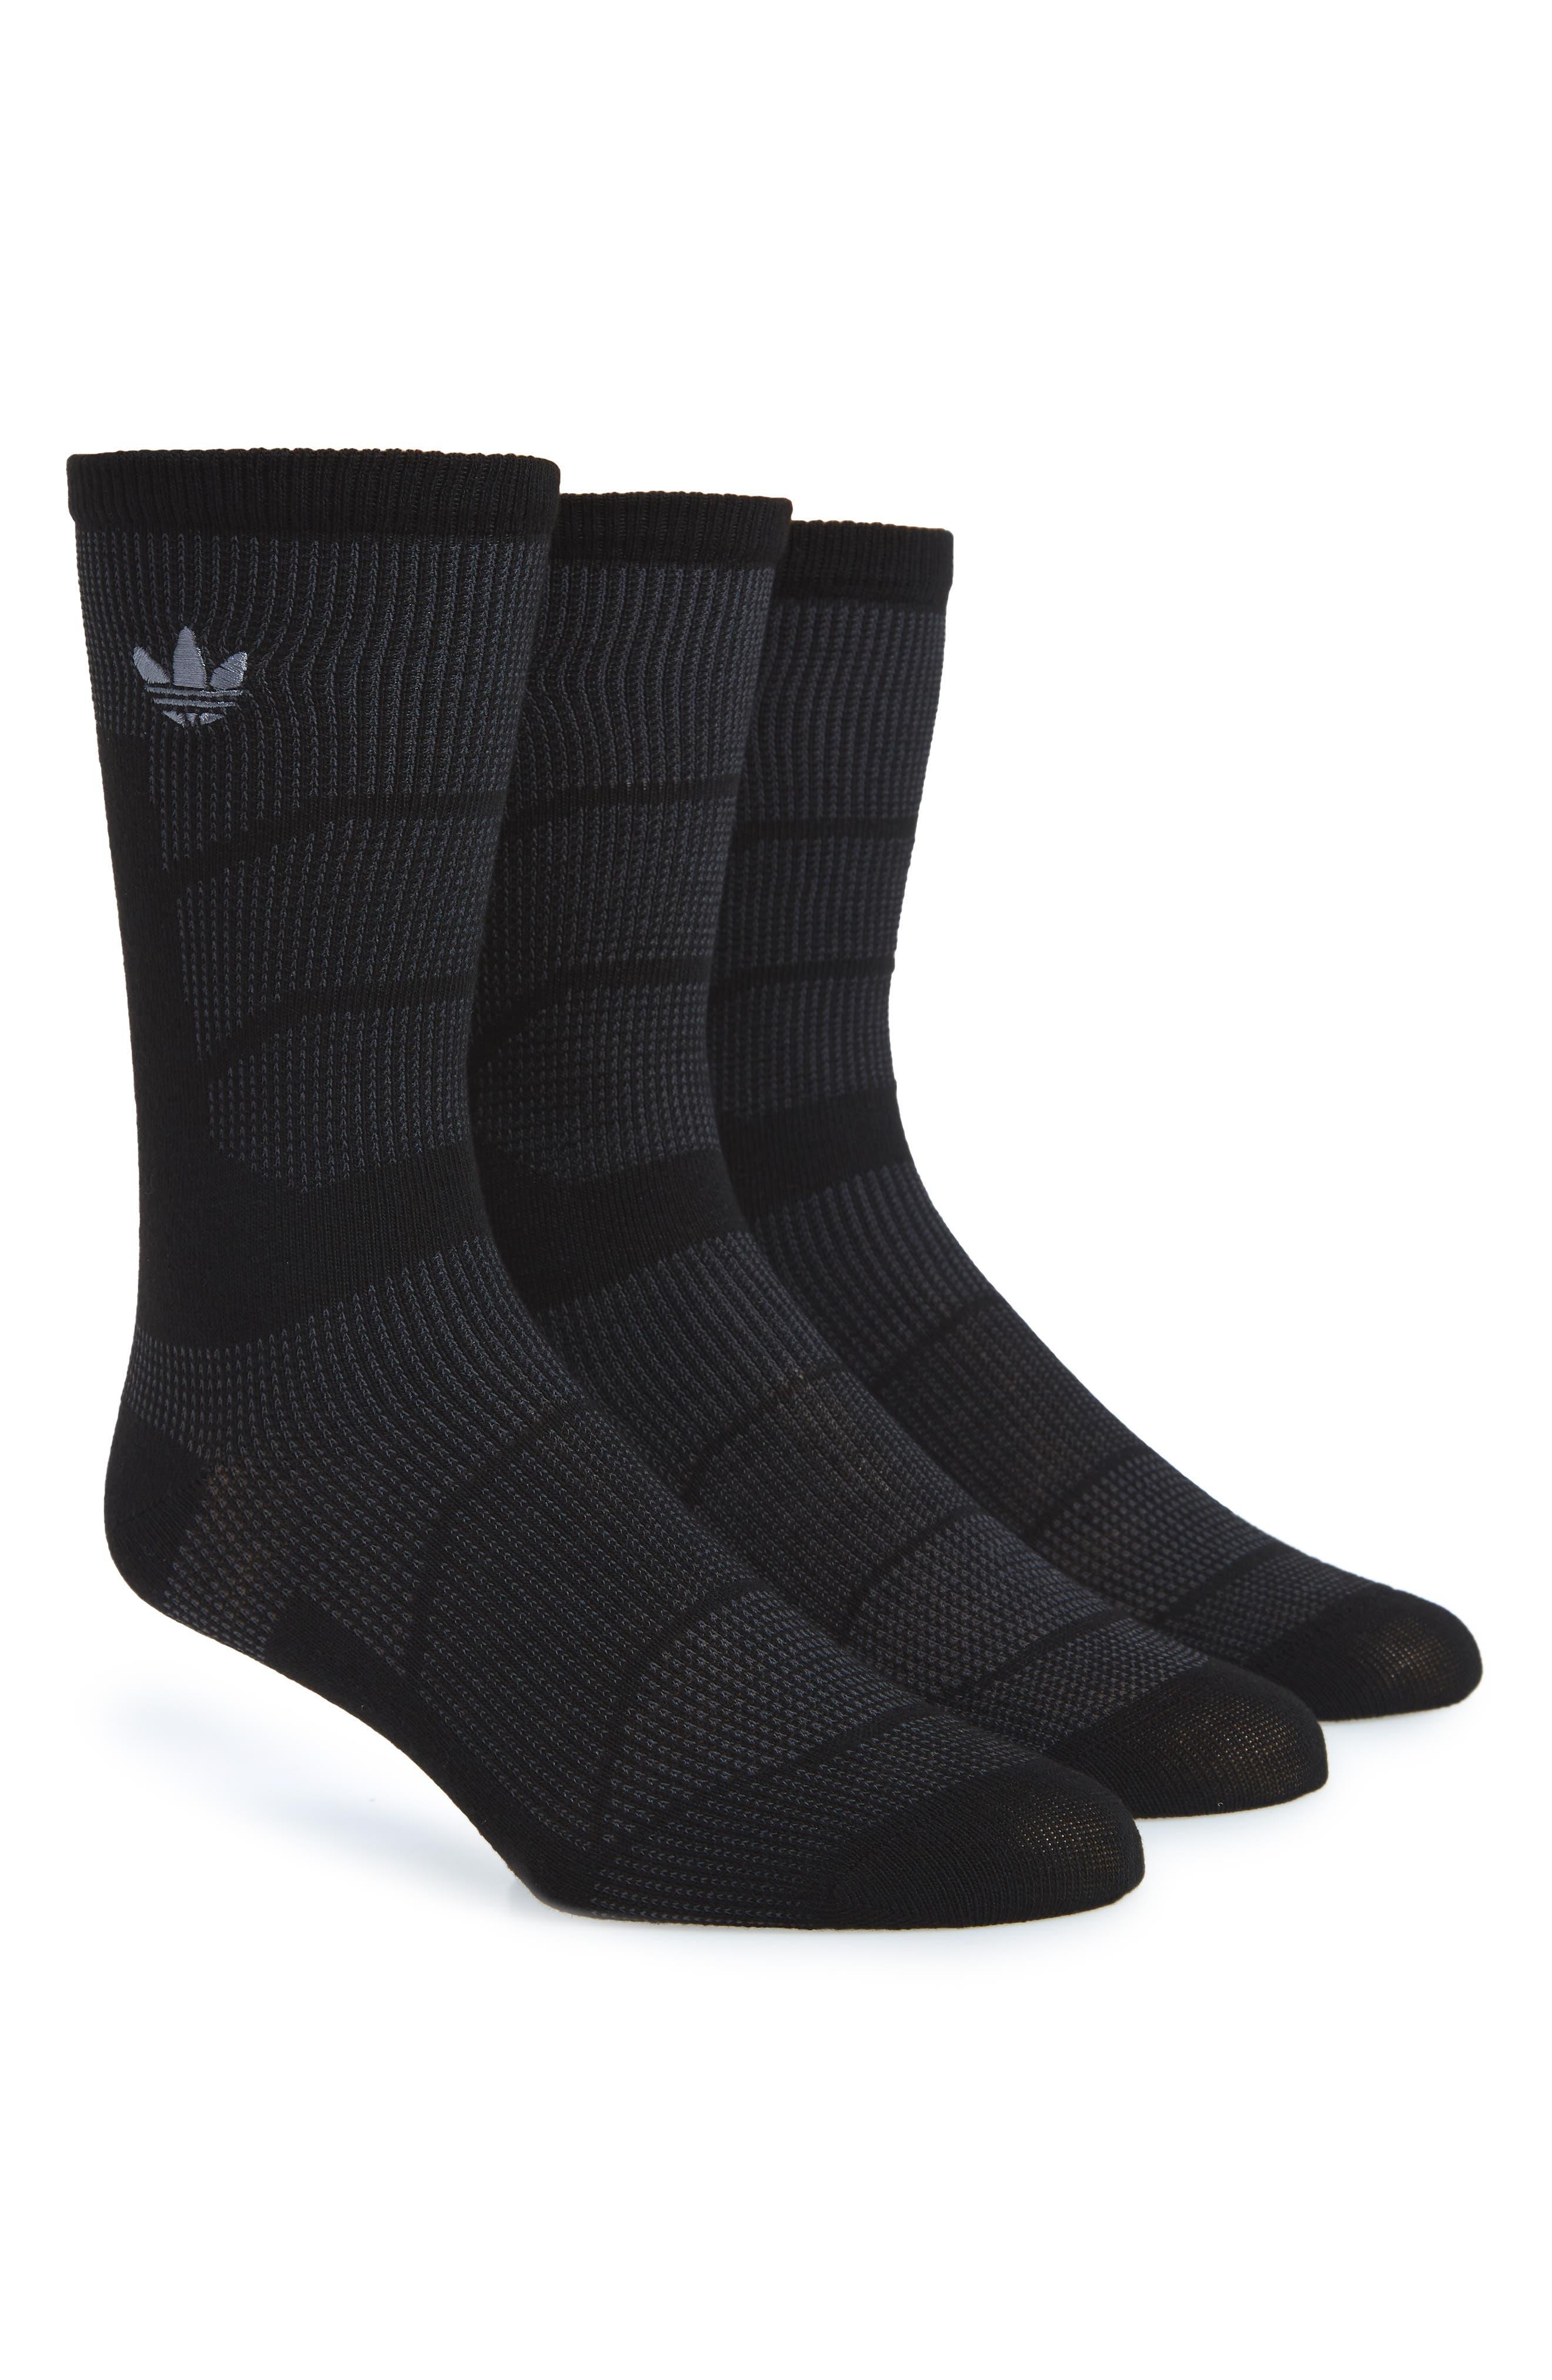 Prime Mesh II 3-Pack Crew Socks,                             Main thumbnail 1, color,                             Black/ Onyx